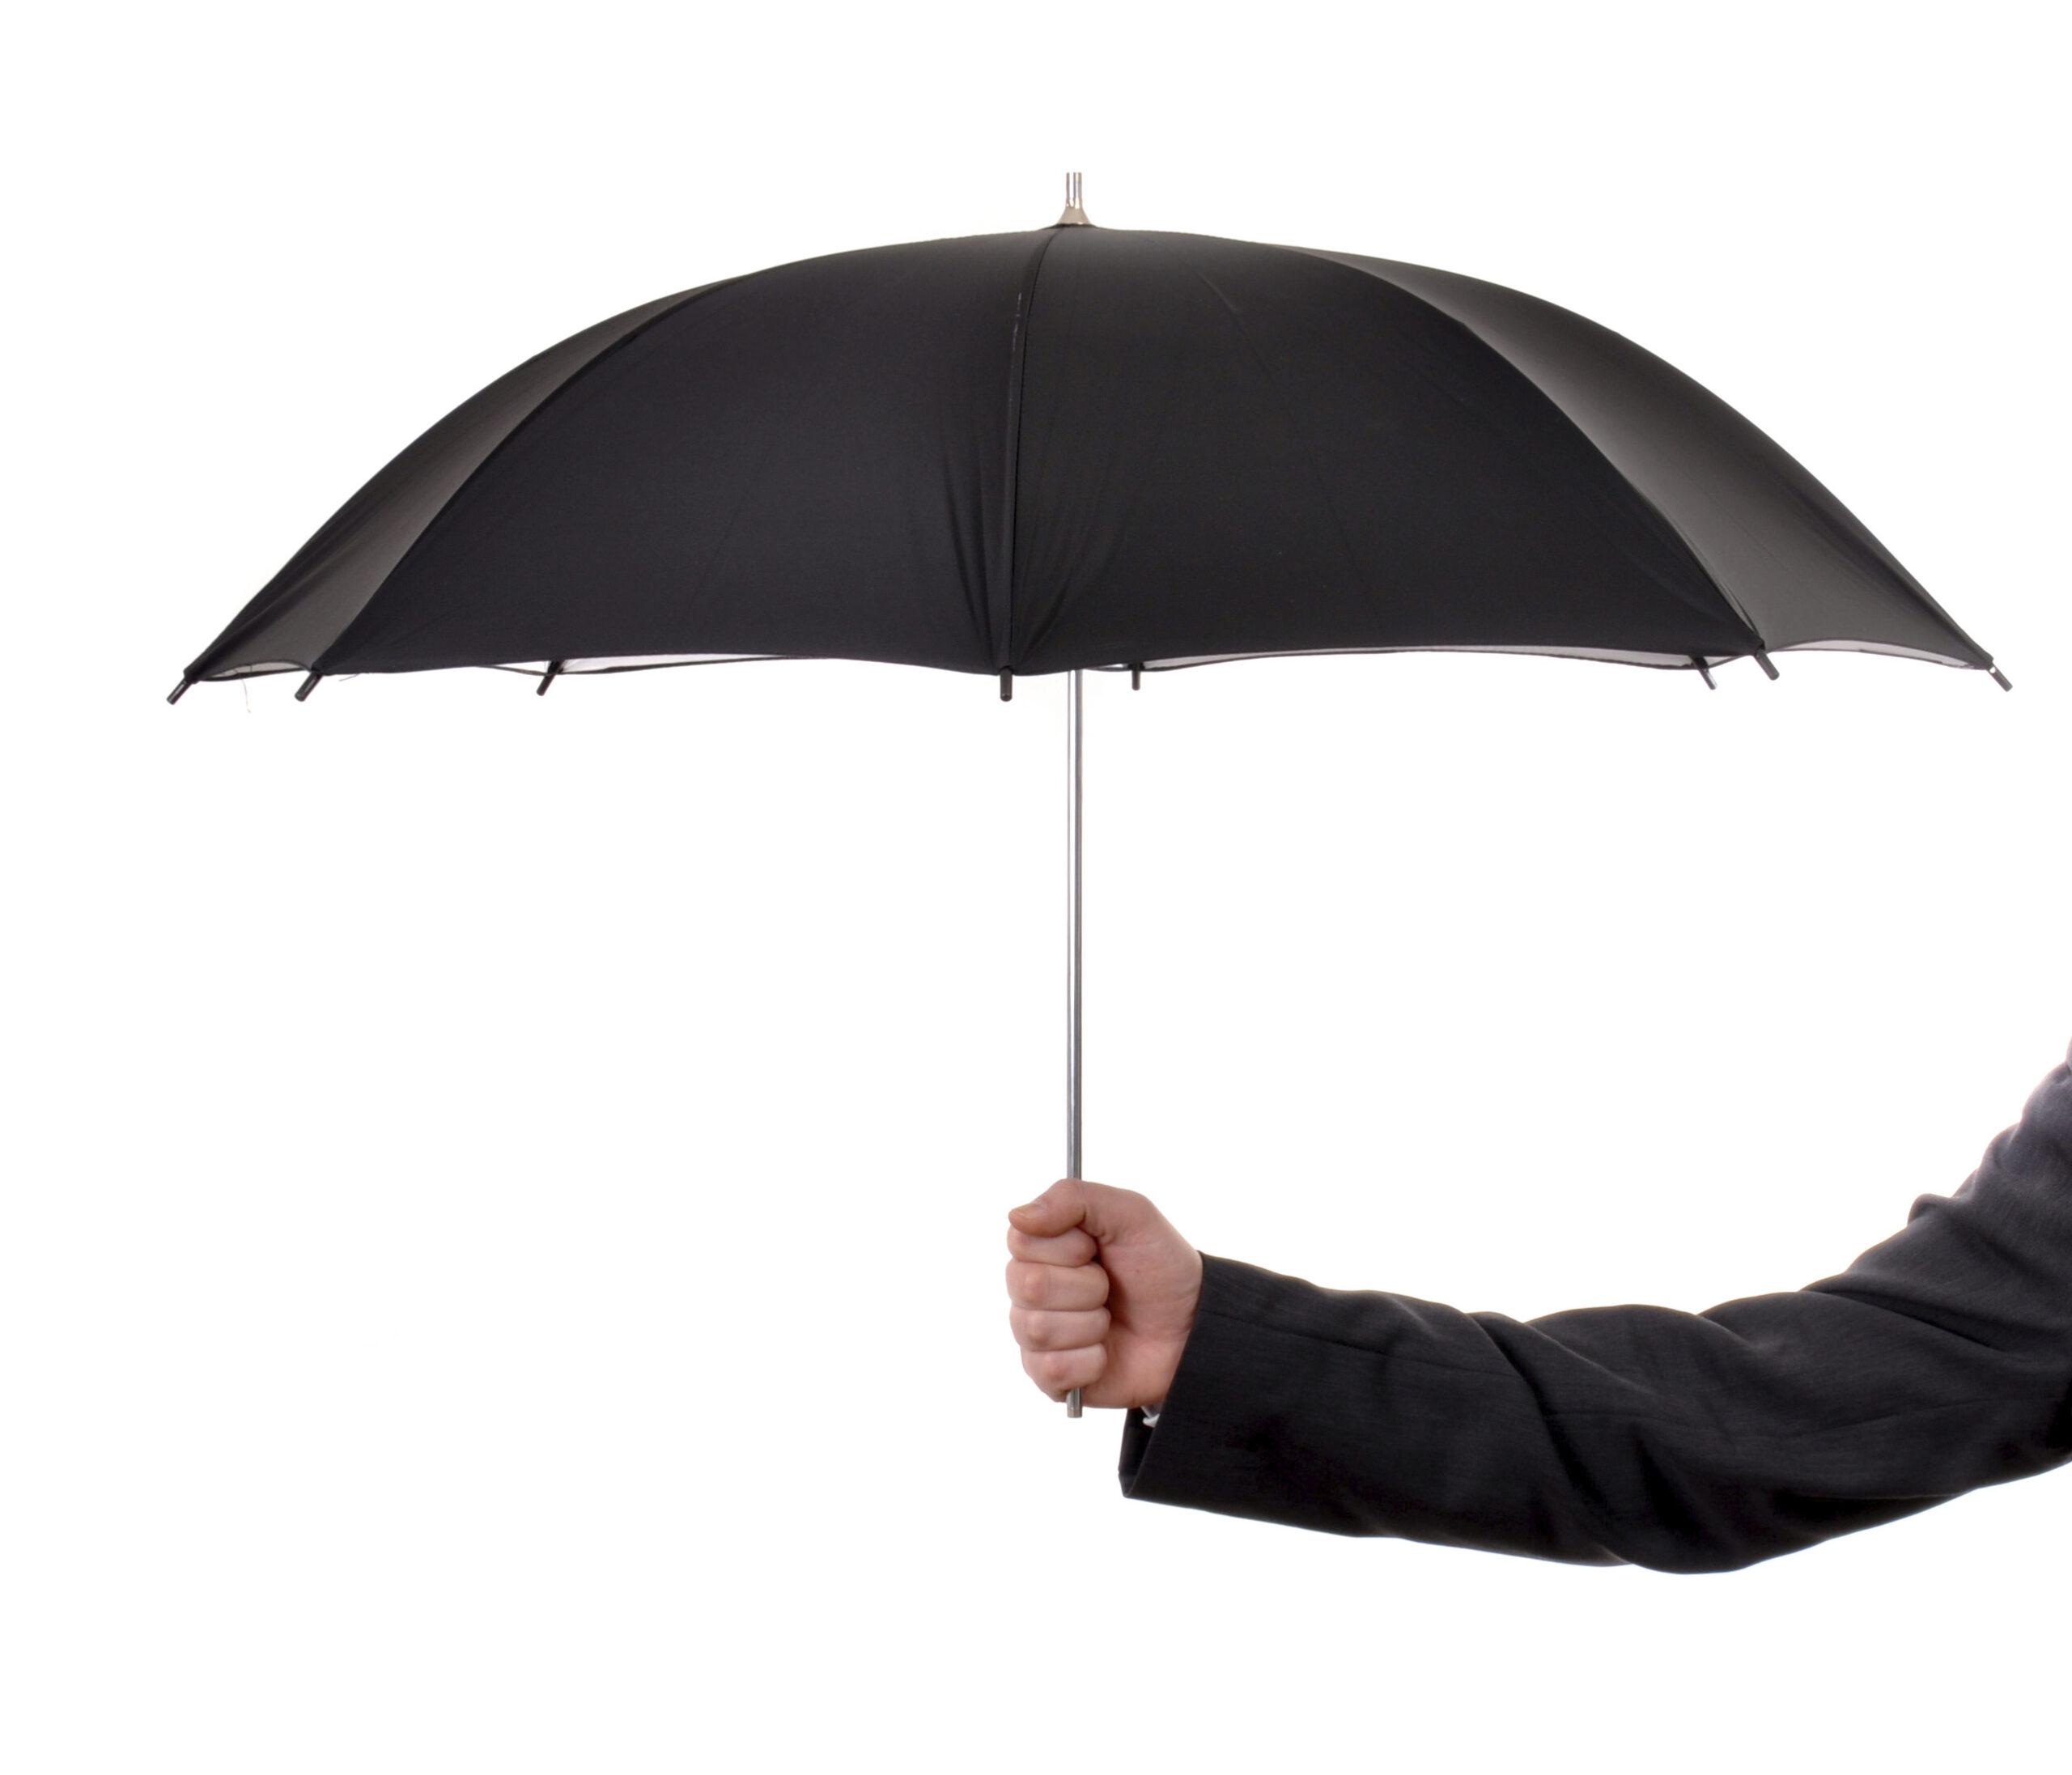 Arm holding a black umbrella